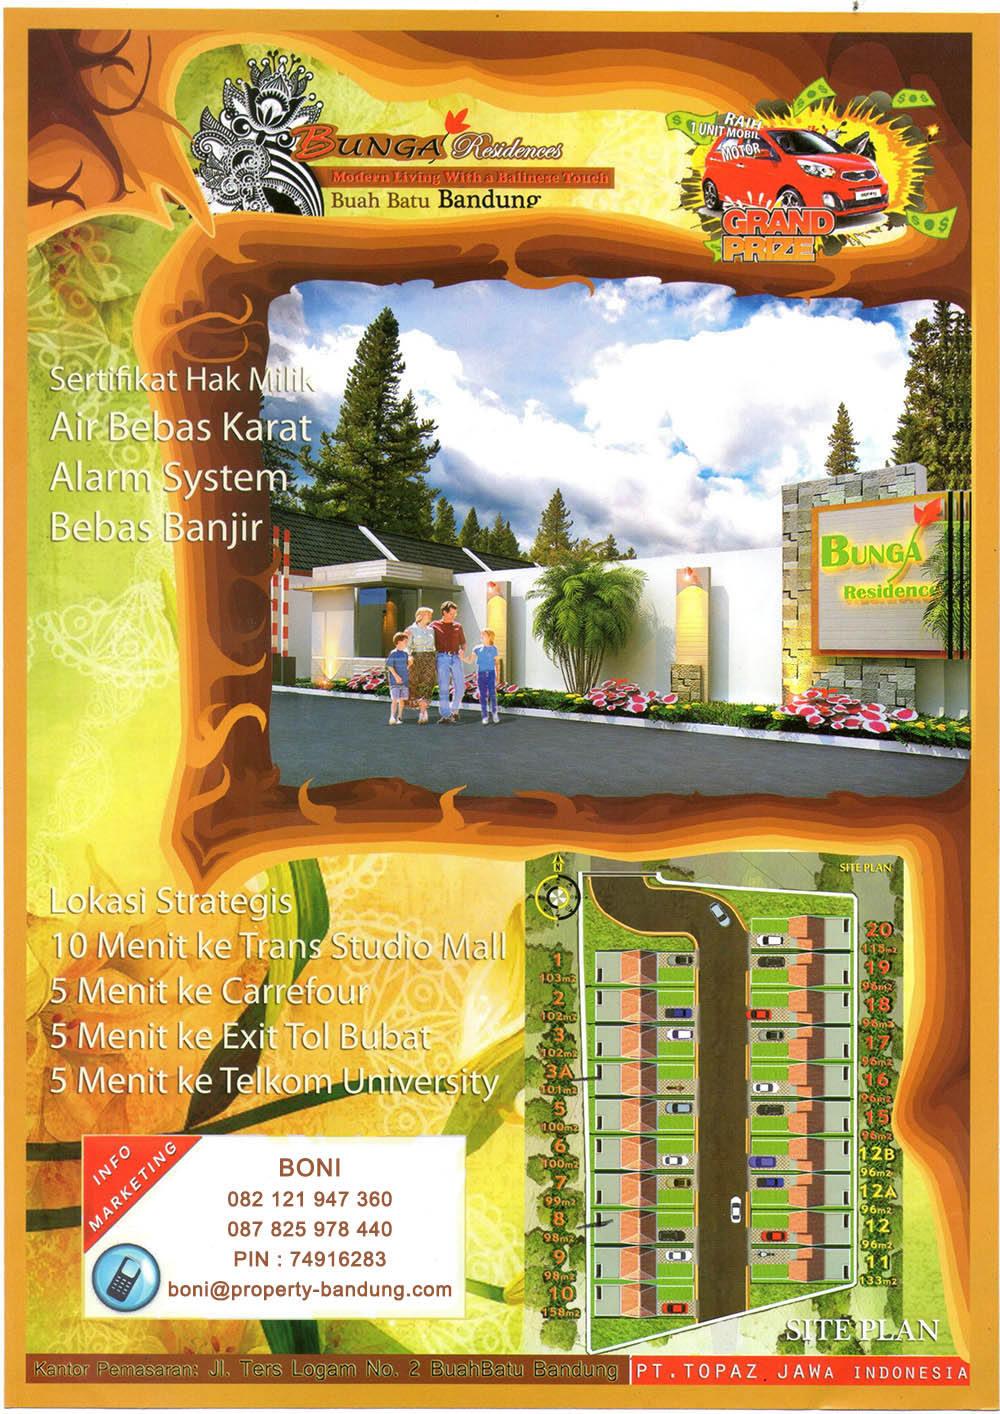 Perumahan Murah Bunga Residences Buah Batu Bandung